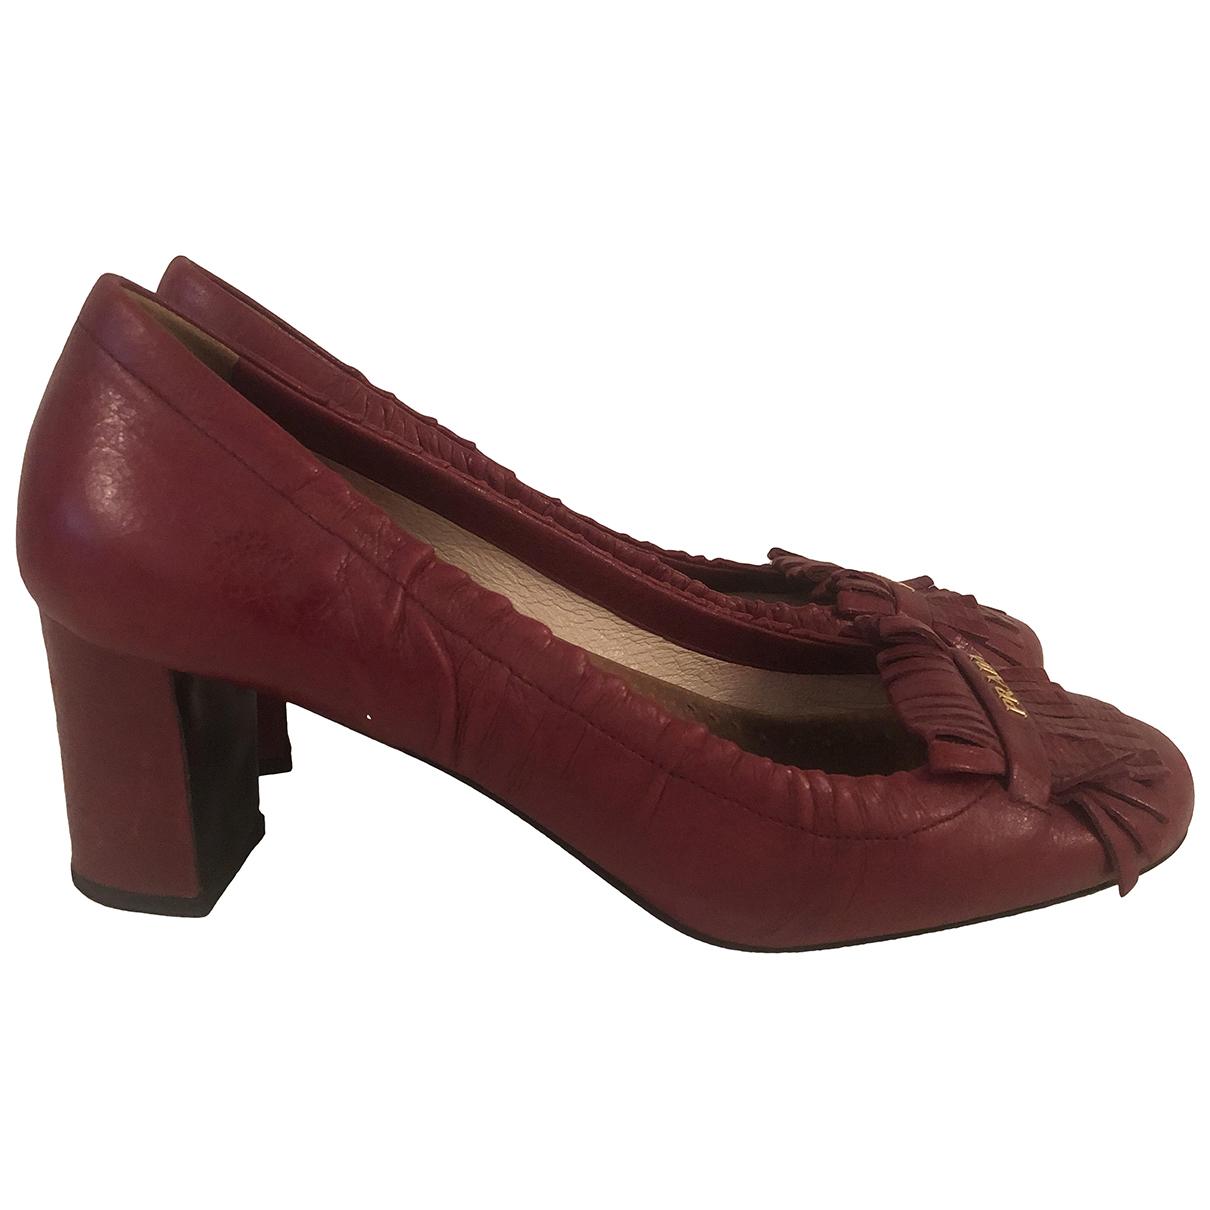 Prada \N Burgundy Leather Heels for Women 38 EU